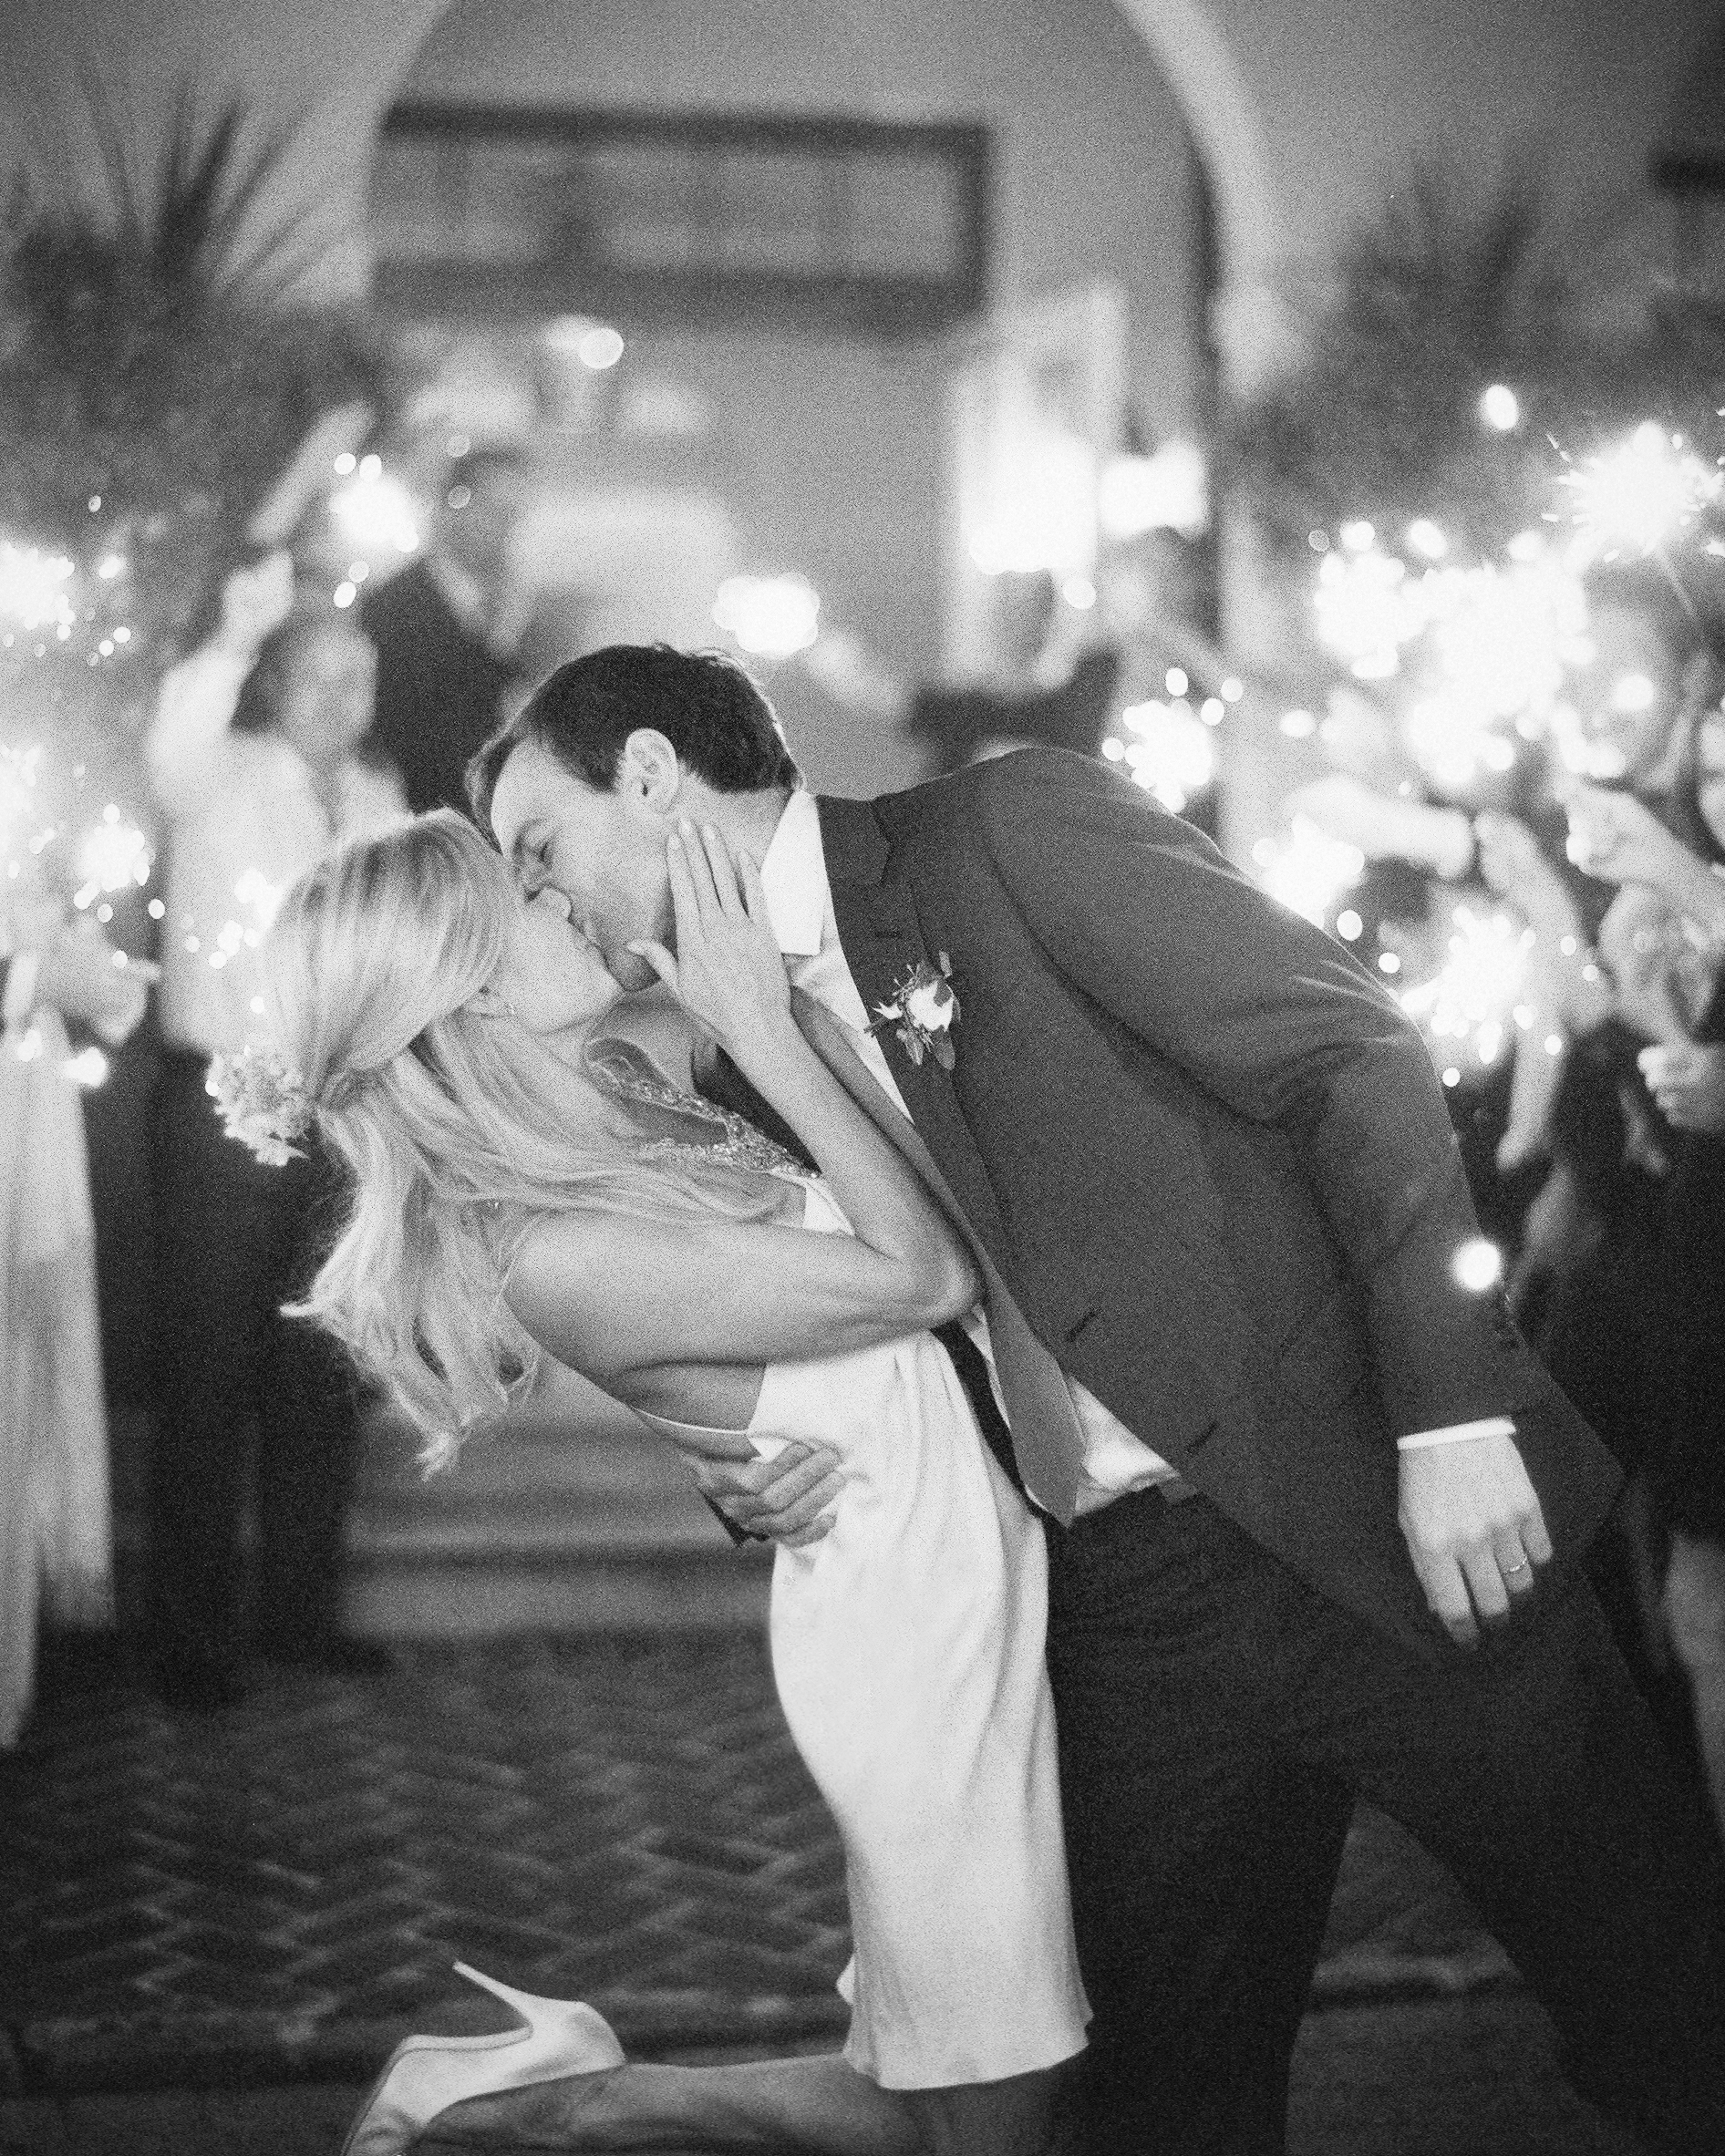 kiss-brideandgroom-bw-059-70005-mwds110148.jpg